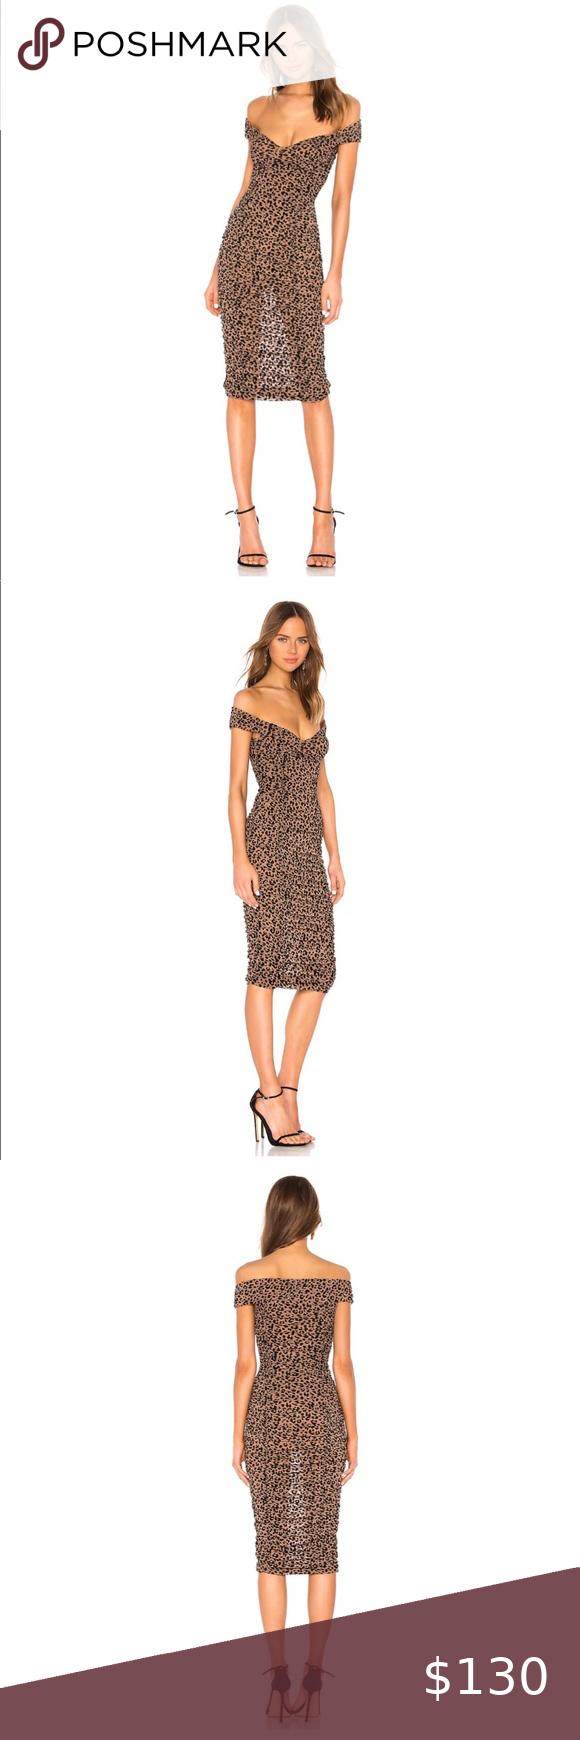 Majorelle Tabitha Midi Dress Off Shoulder Fashion Dresses Midi Dress [ 1740 x 580 Pixel ]